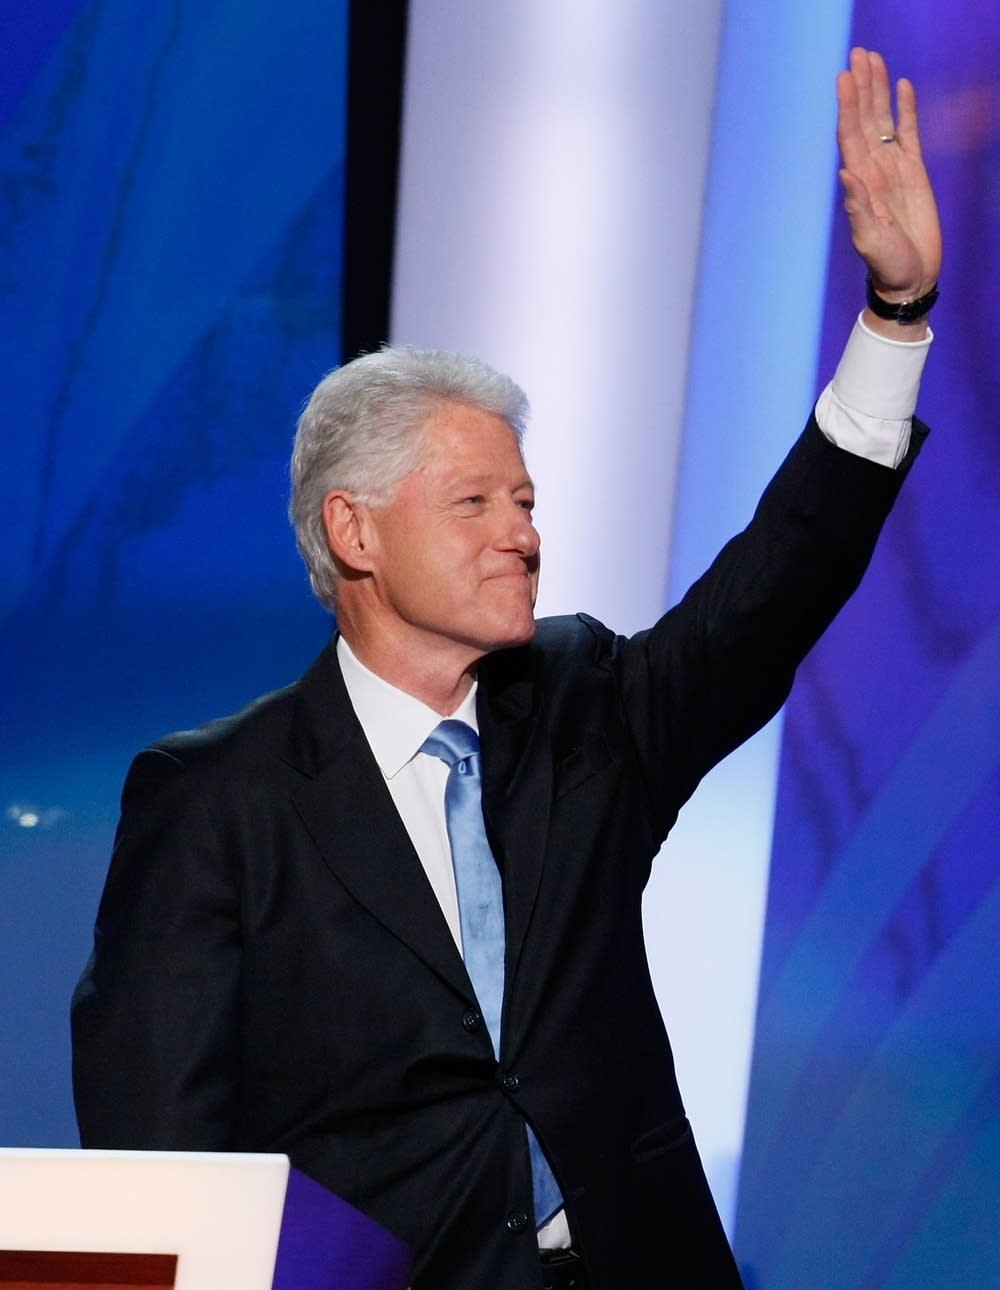 Former U.S. President Bill Clinton at the DNC